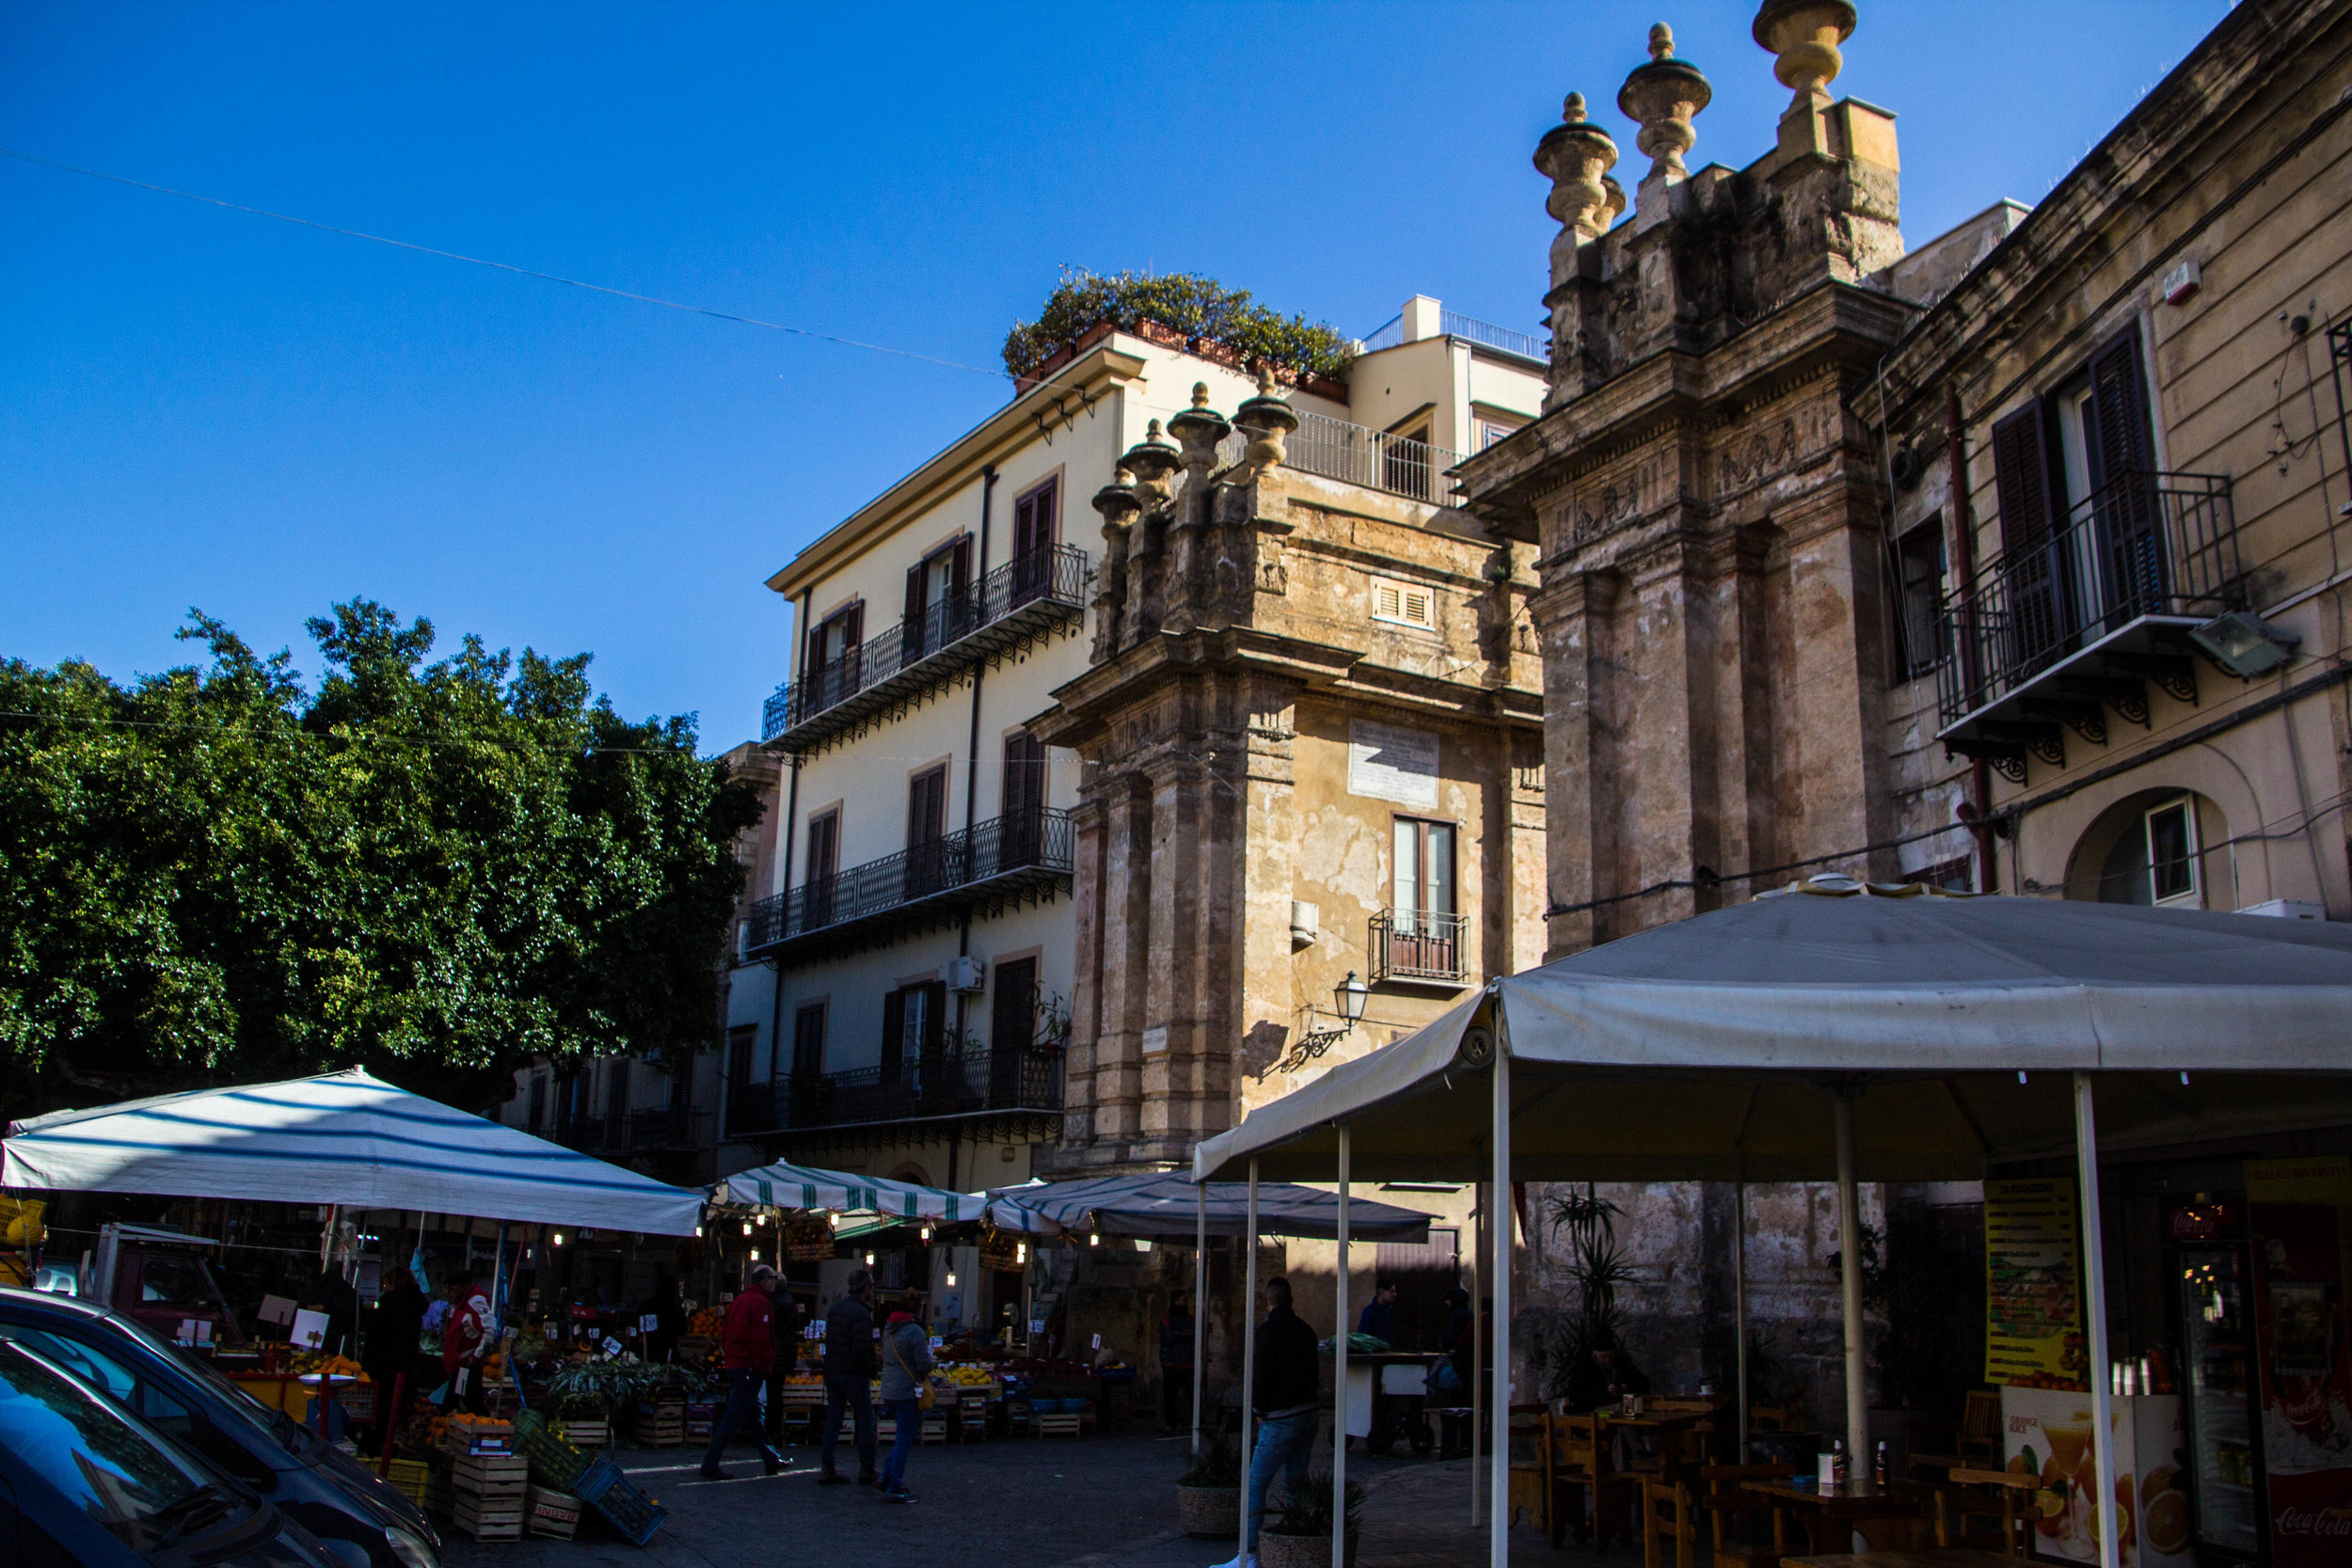 street-markets-palermo-sicily-1.jpg